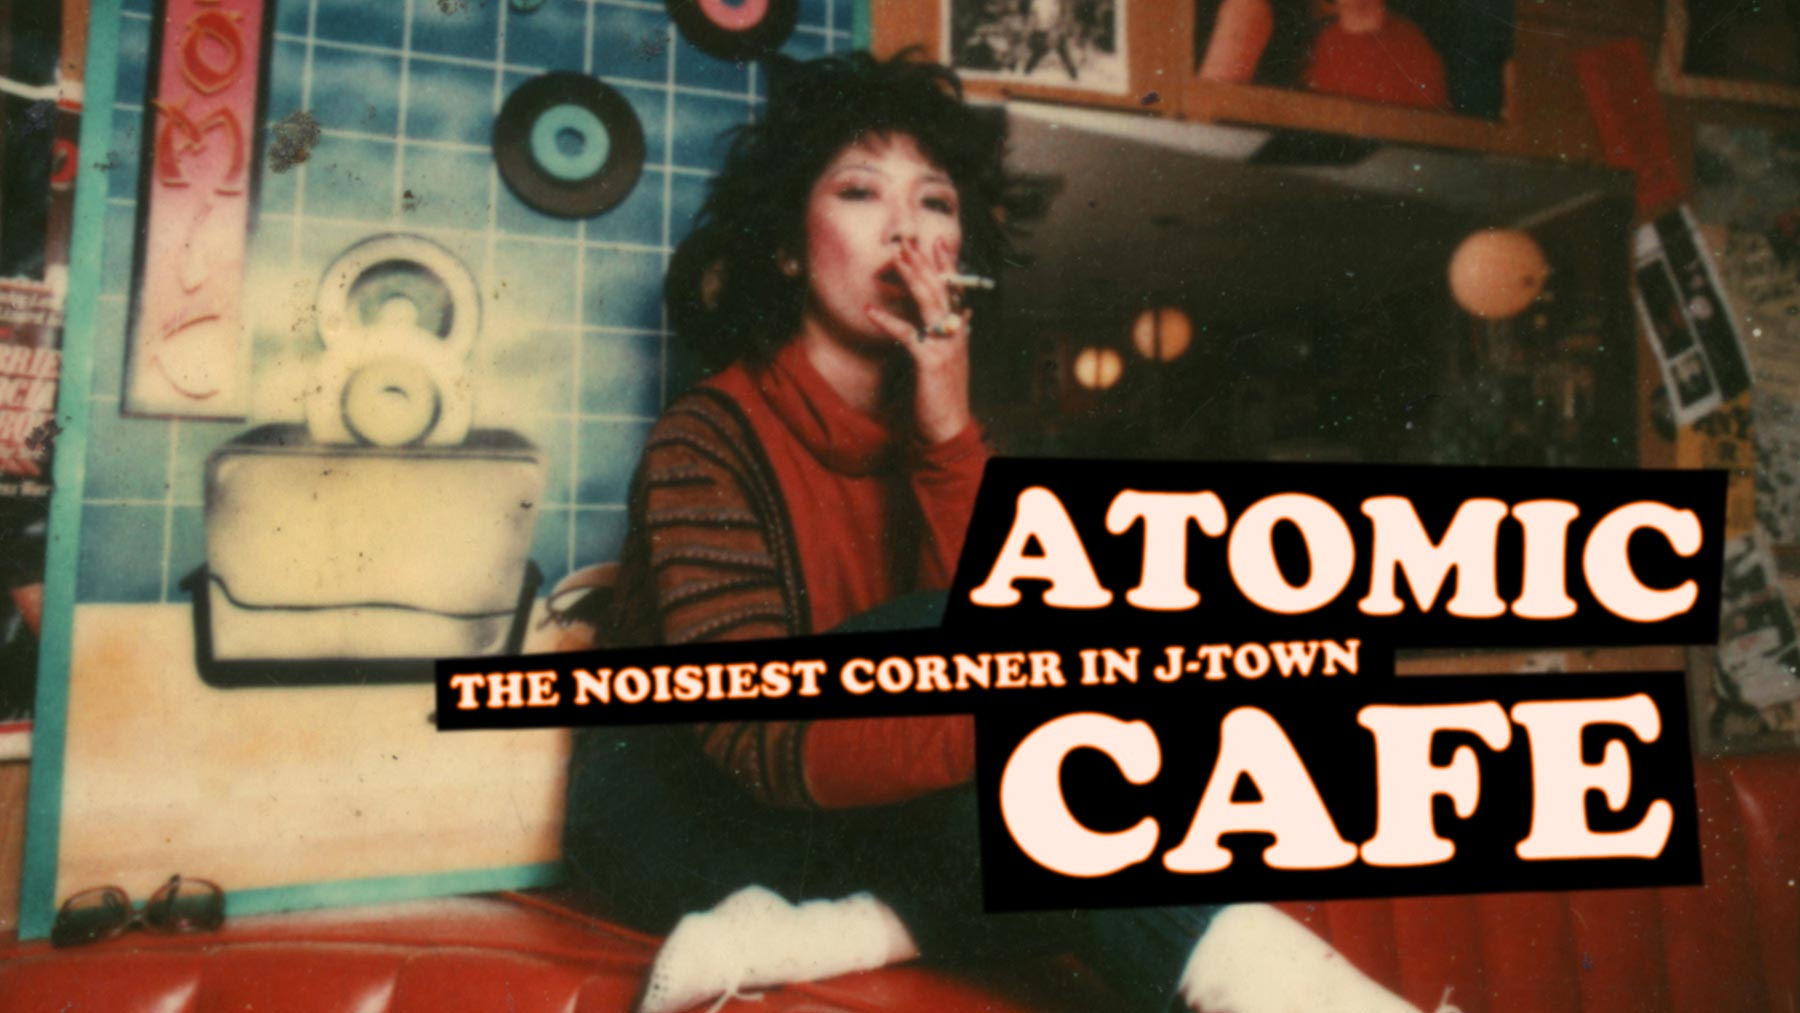 Atomic Cafe still